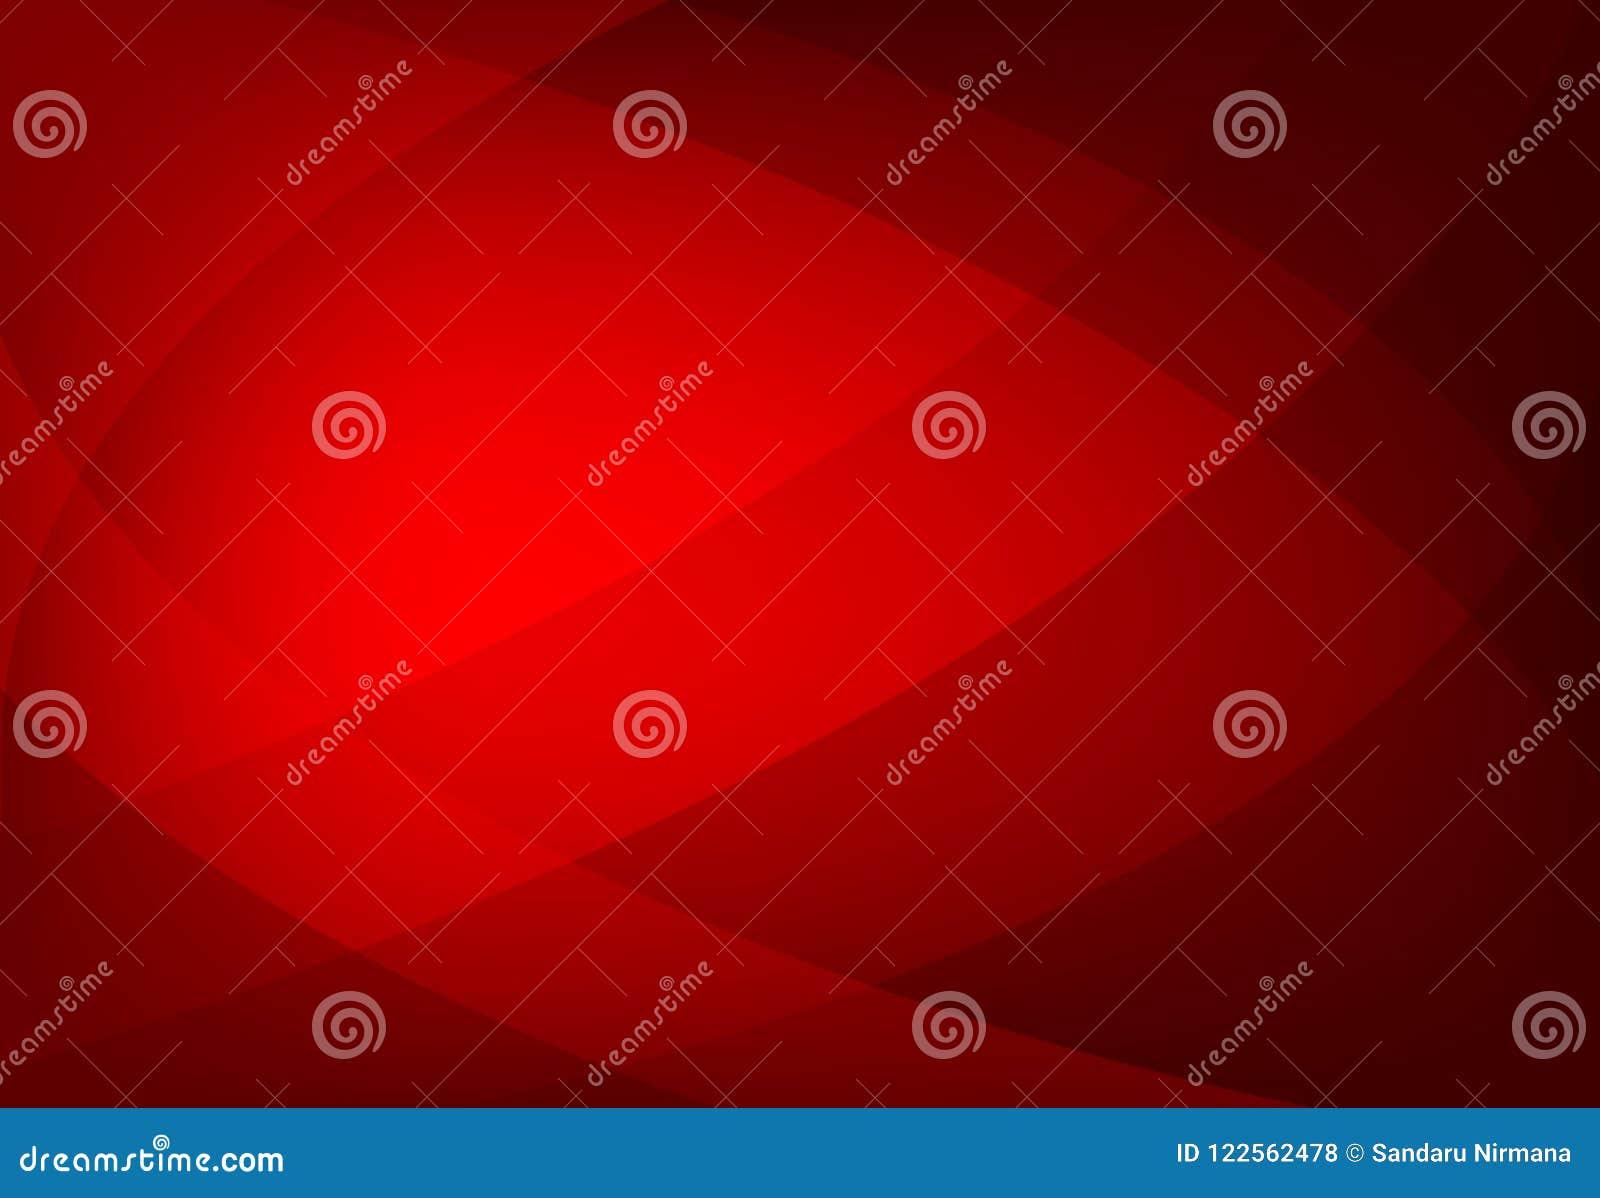 Vector o fundo ondulado geométrico abstrato da cor vermelha, papel de parede para todo o projeto